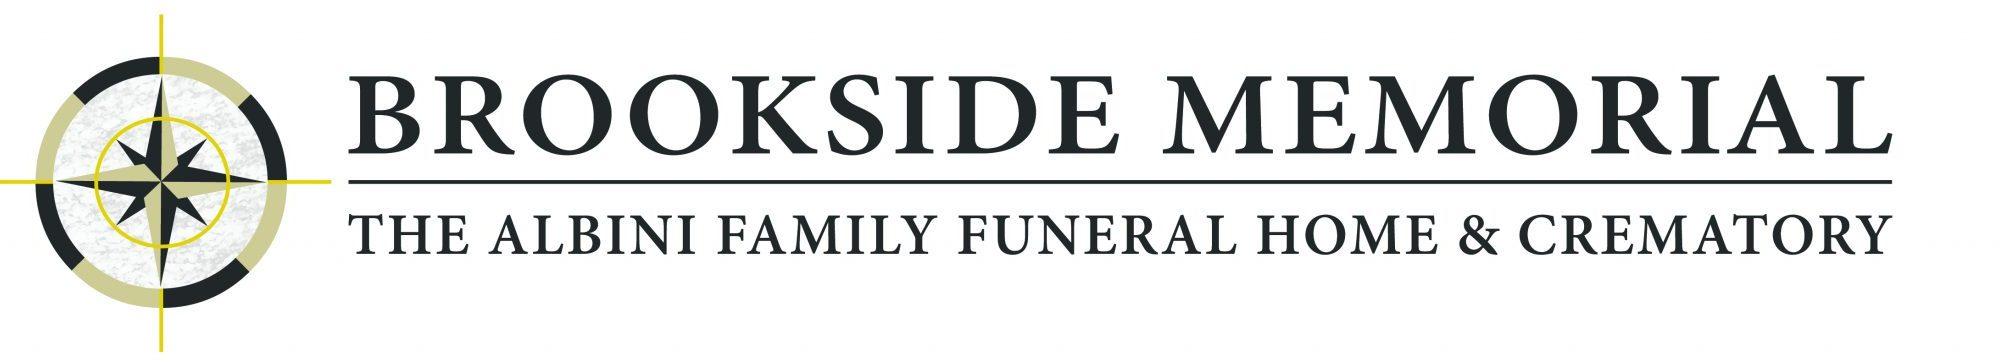 brookside-memorial-logo-final-cmyk-scaled.jpg